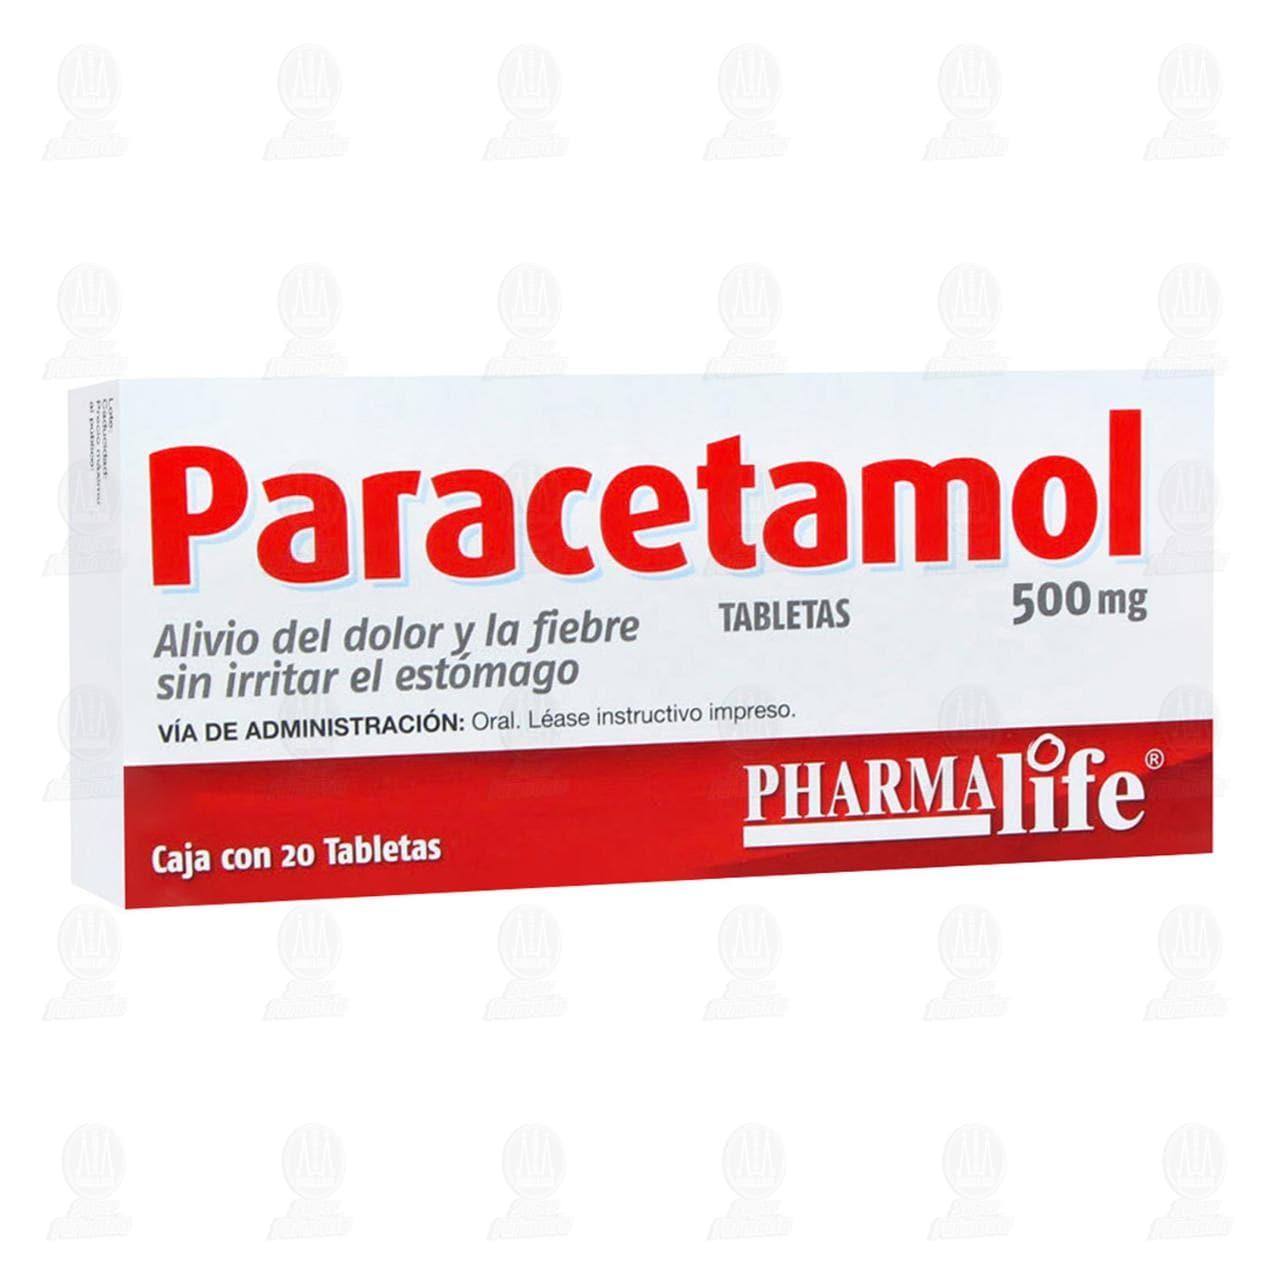 Comprar Paracetamol 500mg 20 Tabletas Pharmalife en Farmacias Guadalajara